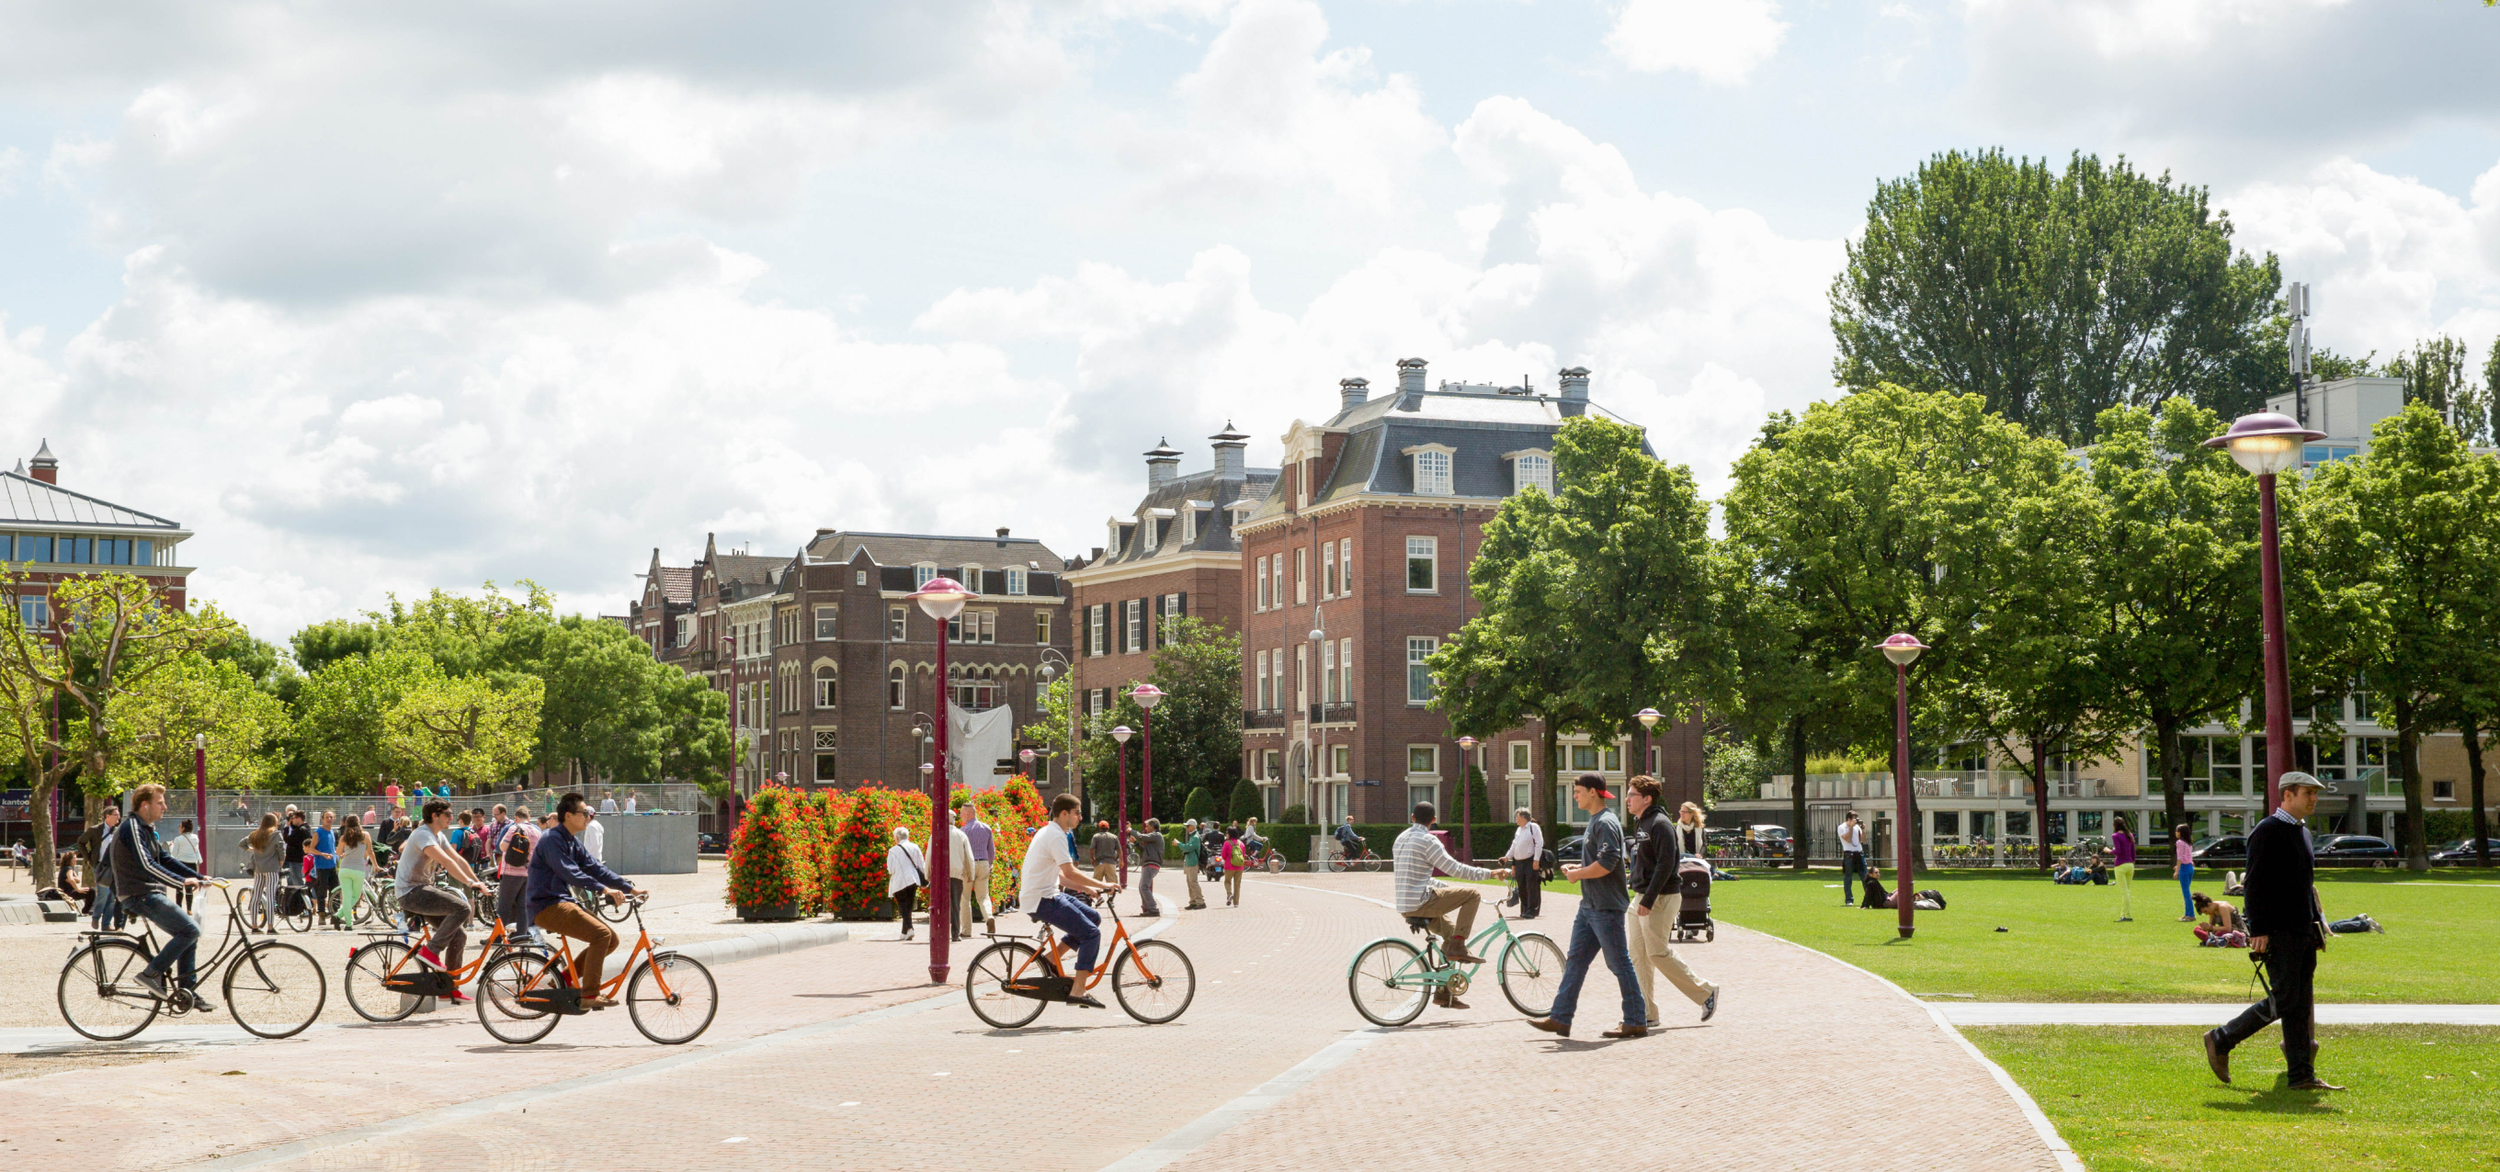 Amsterdam in the summer beautiful scenary